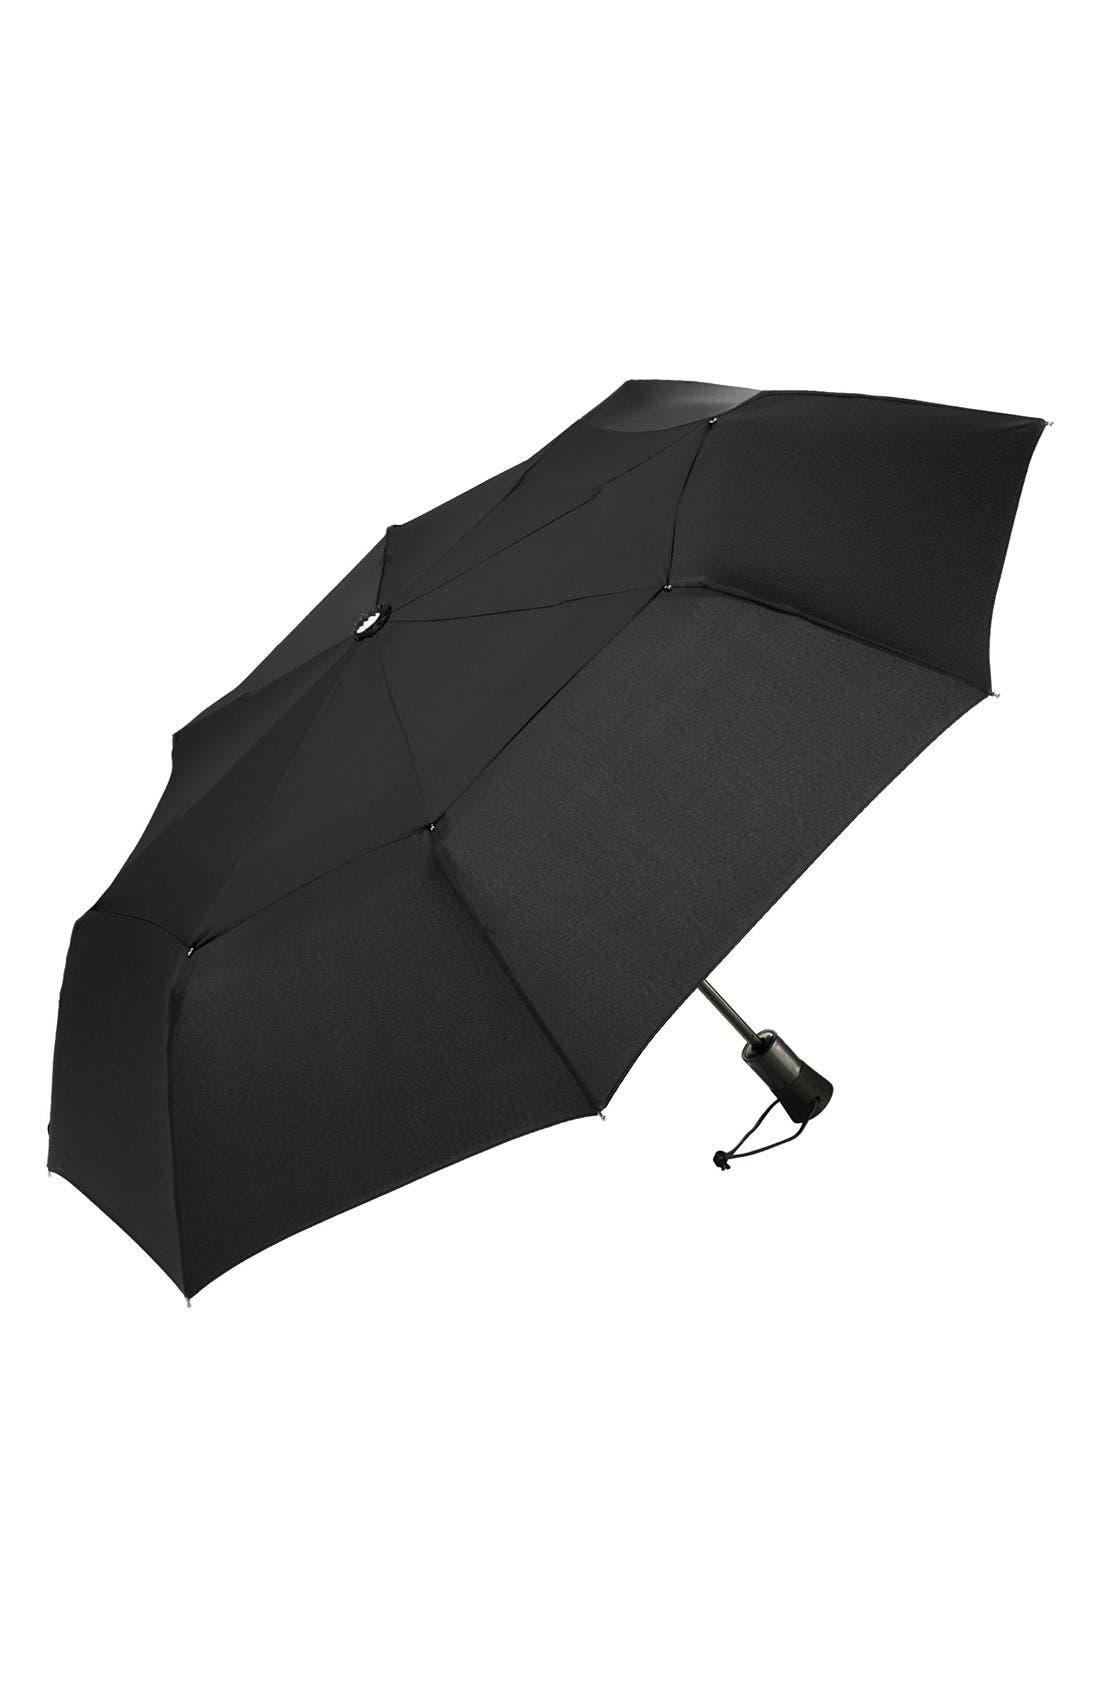 Alternate Image 1 Selected - ShedRain 'WindPro®' Auto Open & Close Umbrella